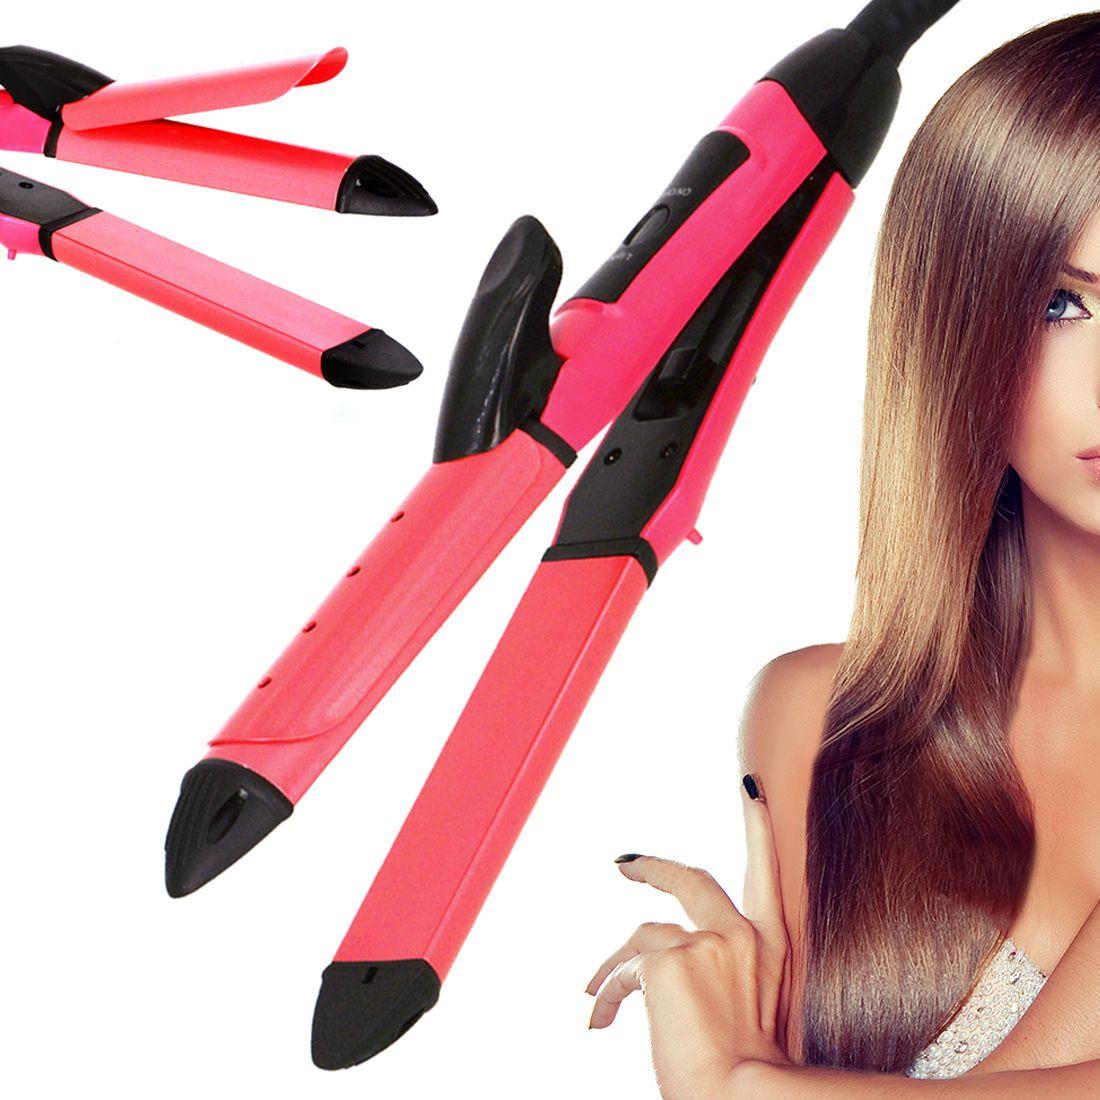 SJ 2 in 1 Travel Professional Hair Straighteners Flat Iron 45W Hair Straightener ( Red )